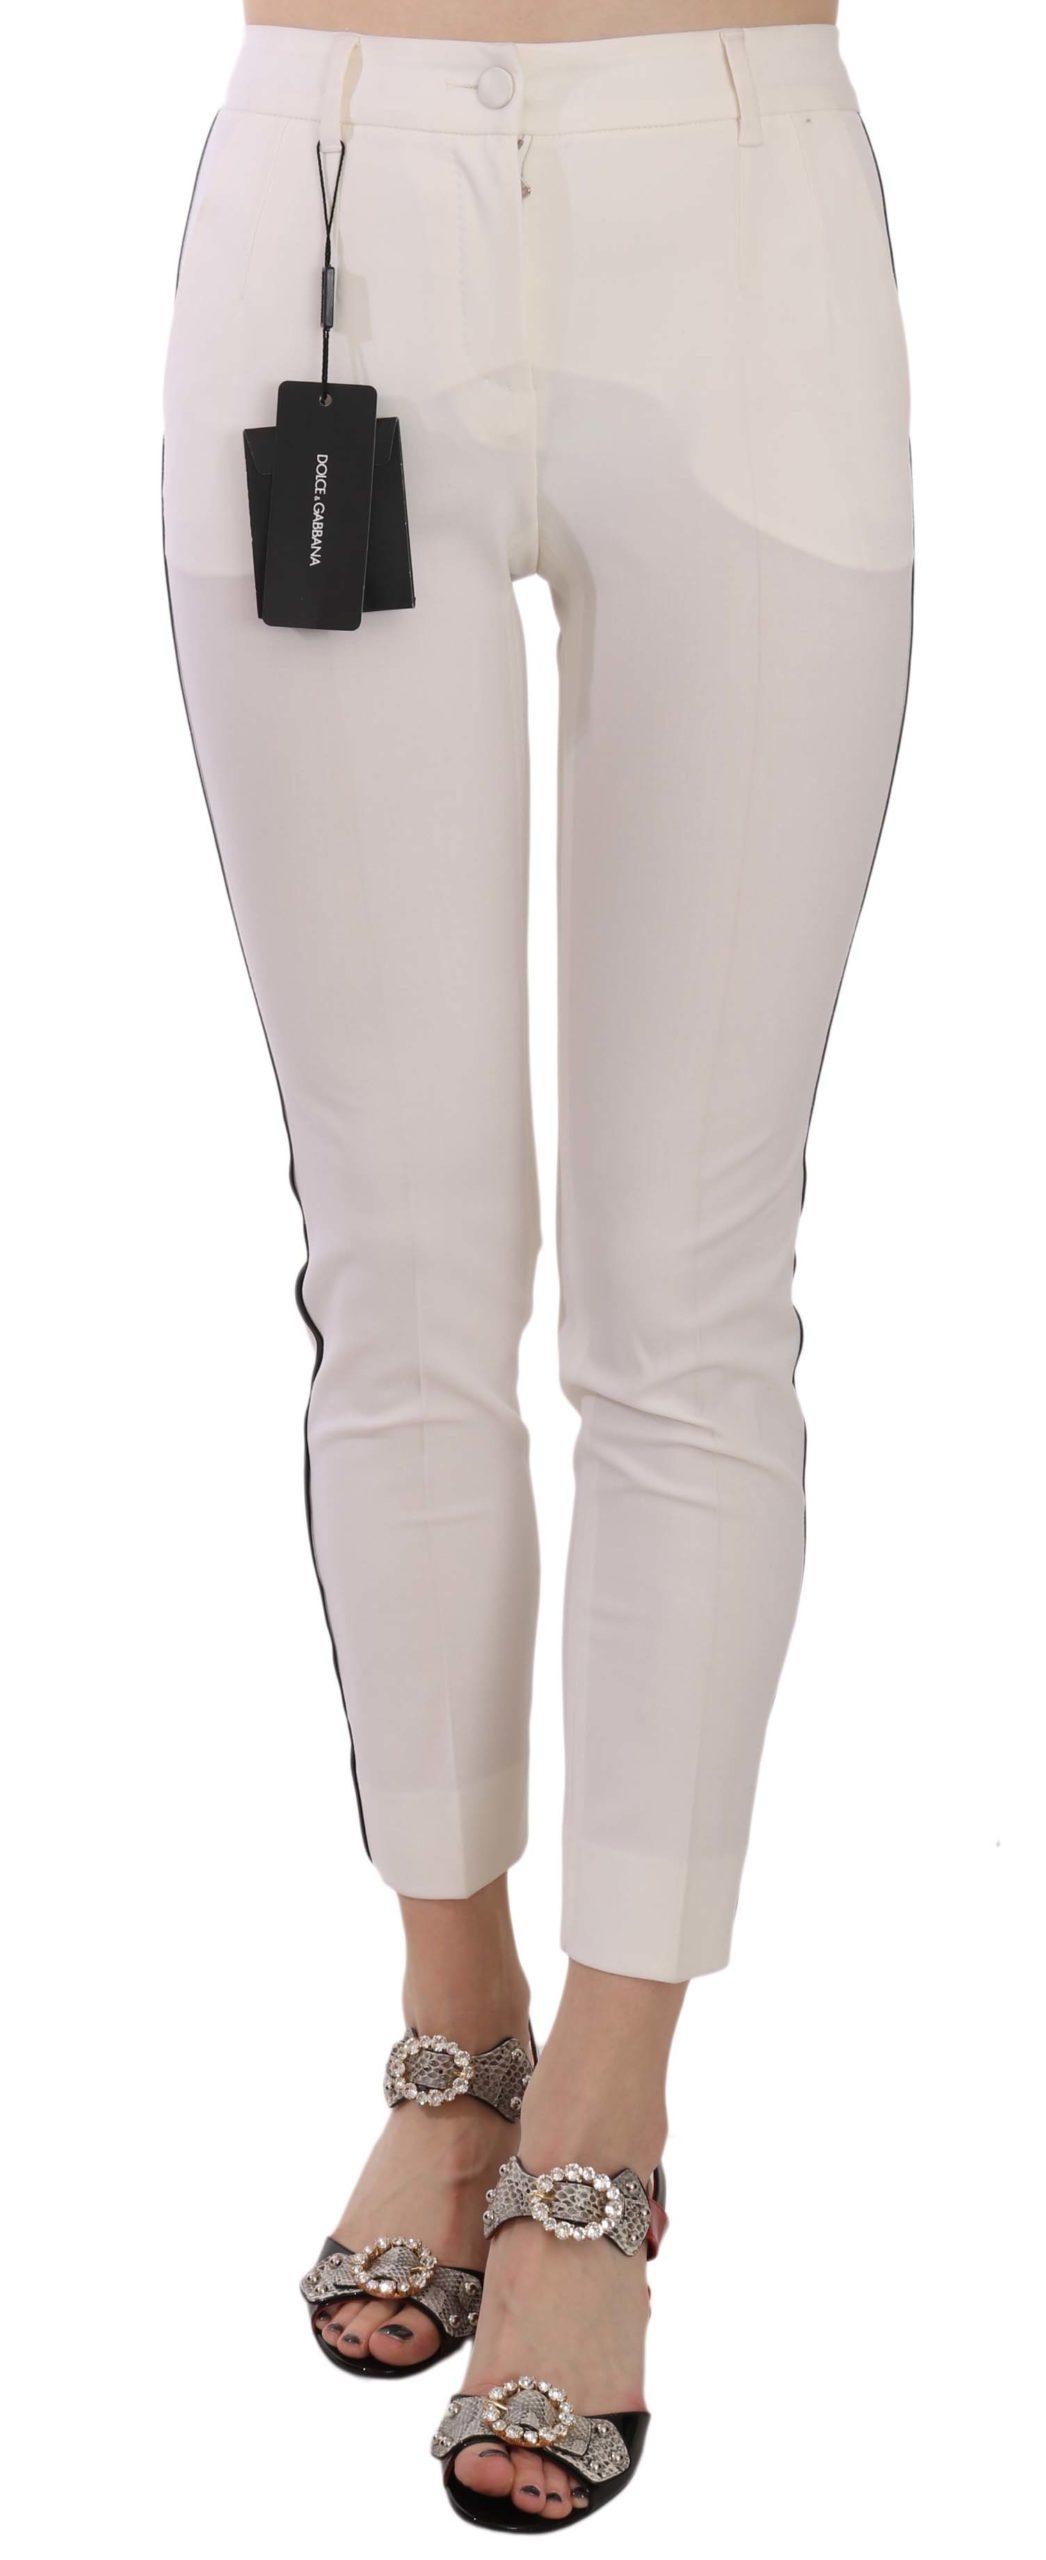 Dolce & Gabbana Women's Side Stripe Cropped Skinny Trouser White PAN70047 - IT36 XXS